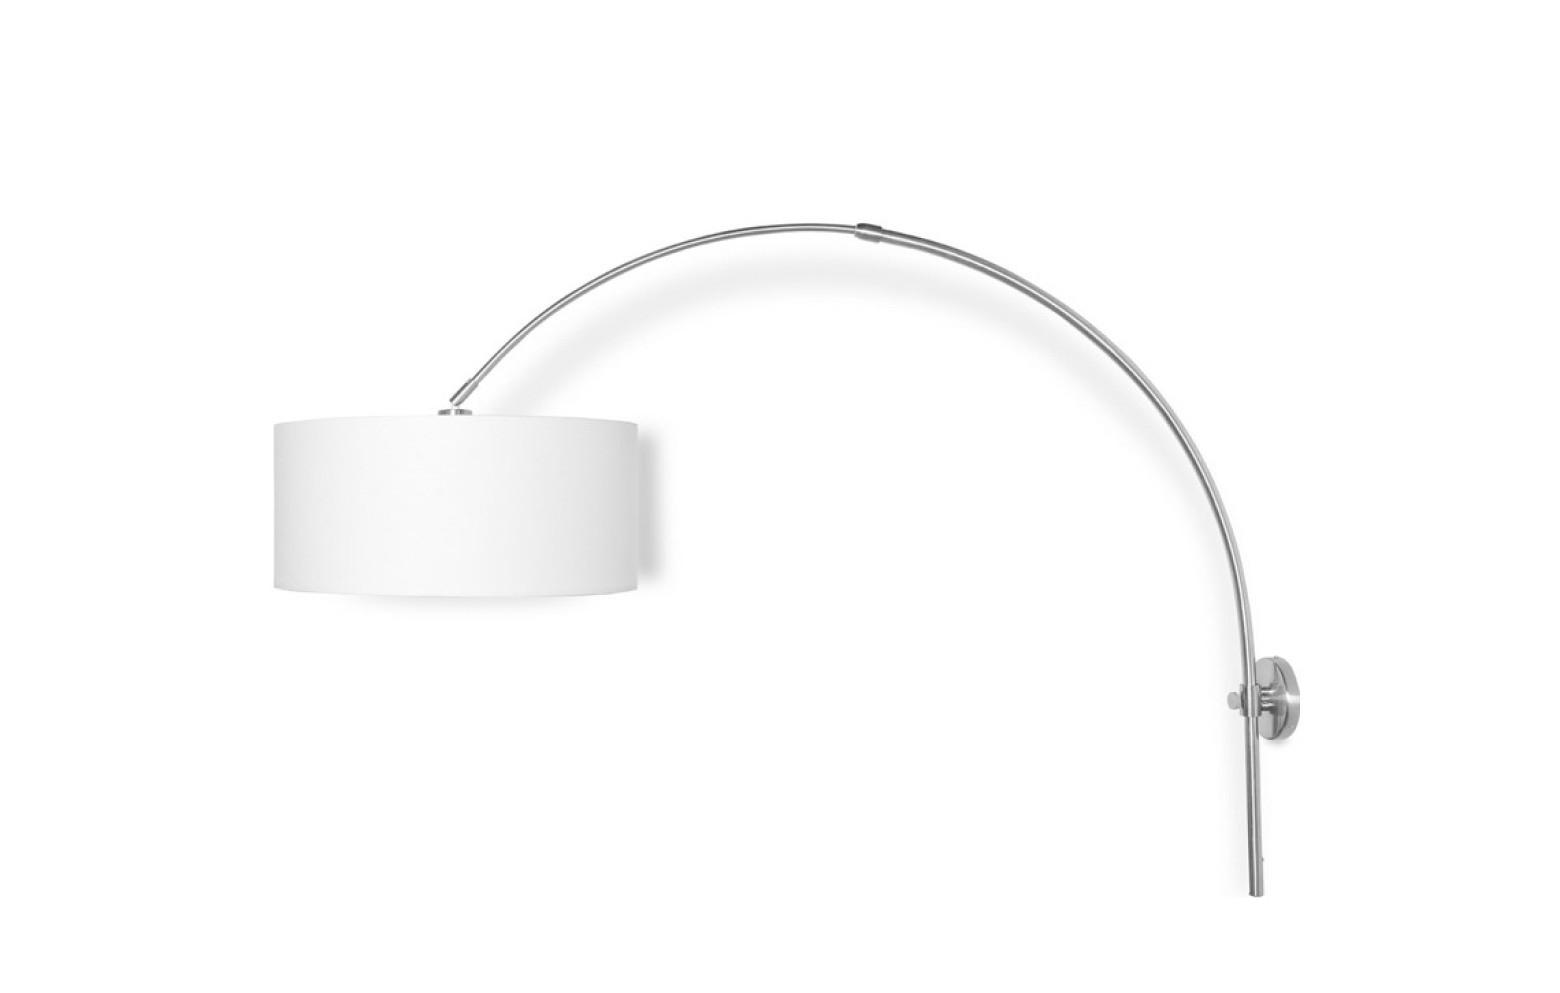 bolivia wandleuchte lampen kleinm bel accessoires who 39 s perfect. Black Bedroom Furniture Sets. Home Design Ideas